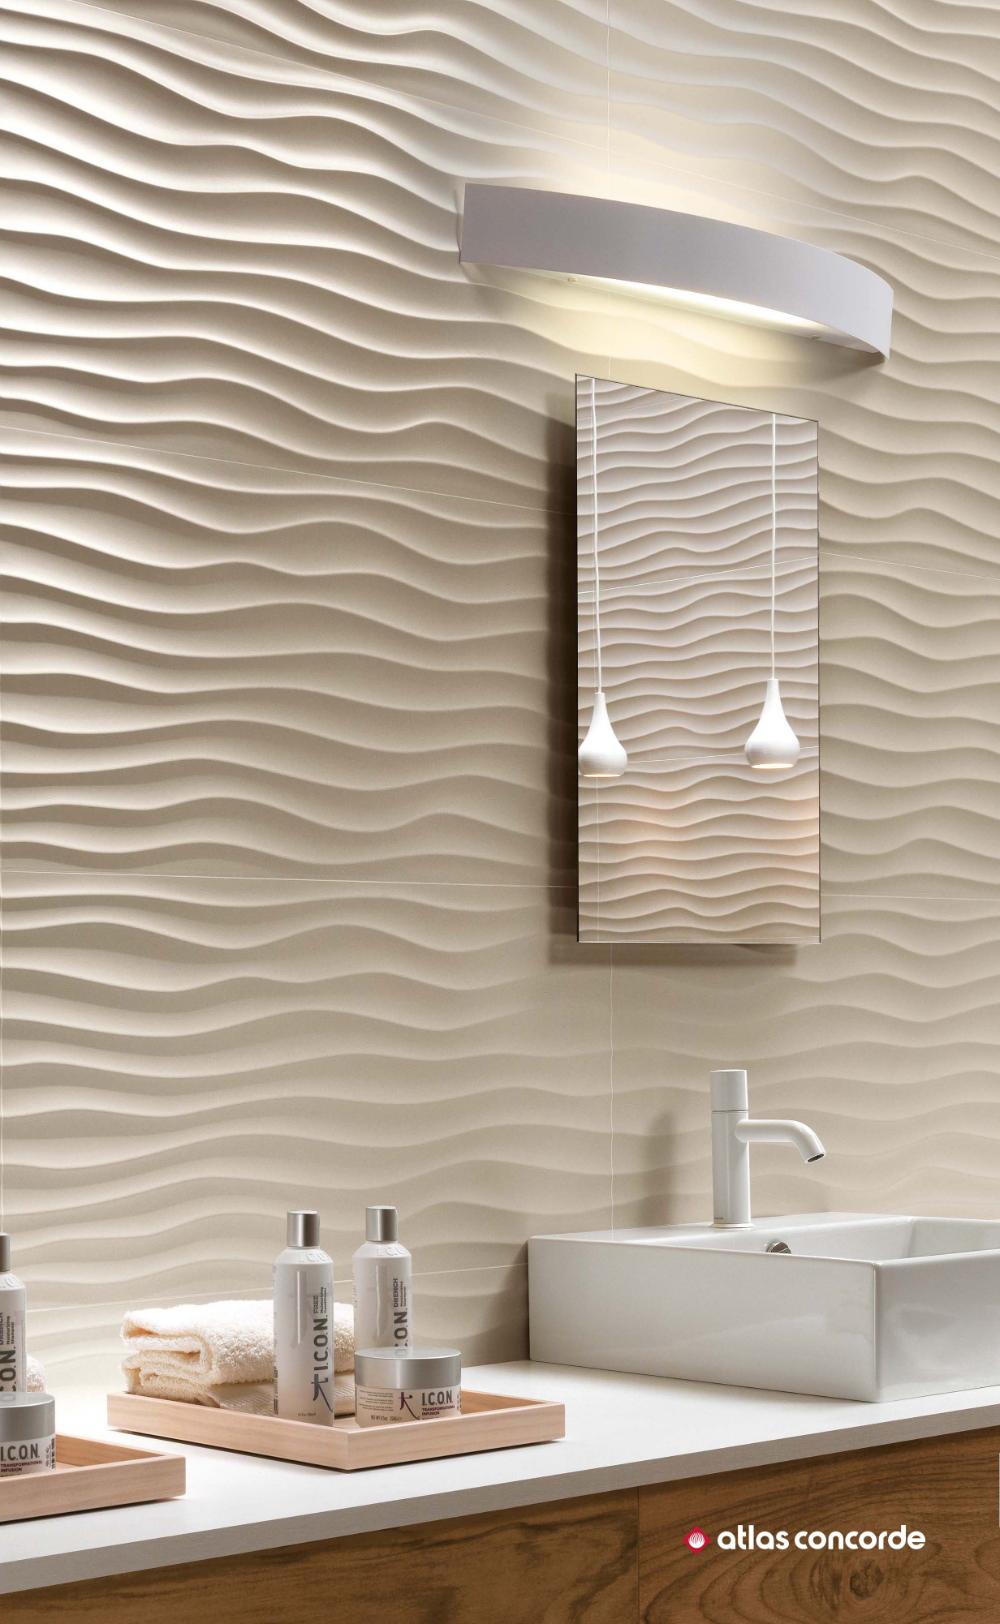 Decorative Bathroom Wall Tile Designs In 2020 Bathroom Wall Tile Design Wall Tiles Design Bathroom Wall Tile